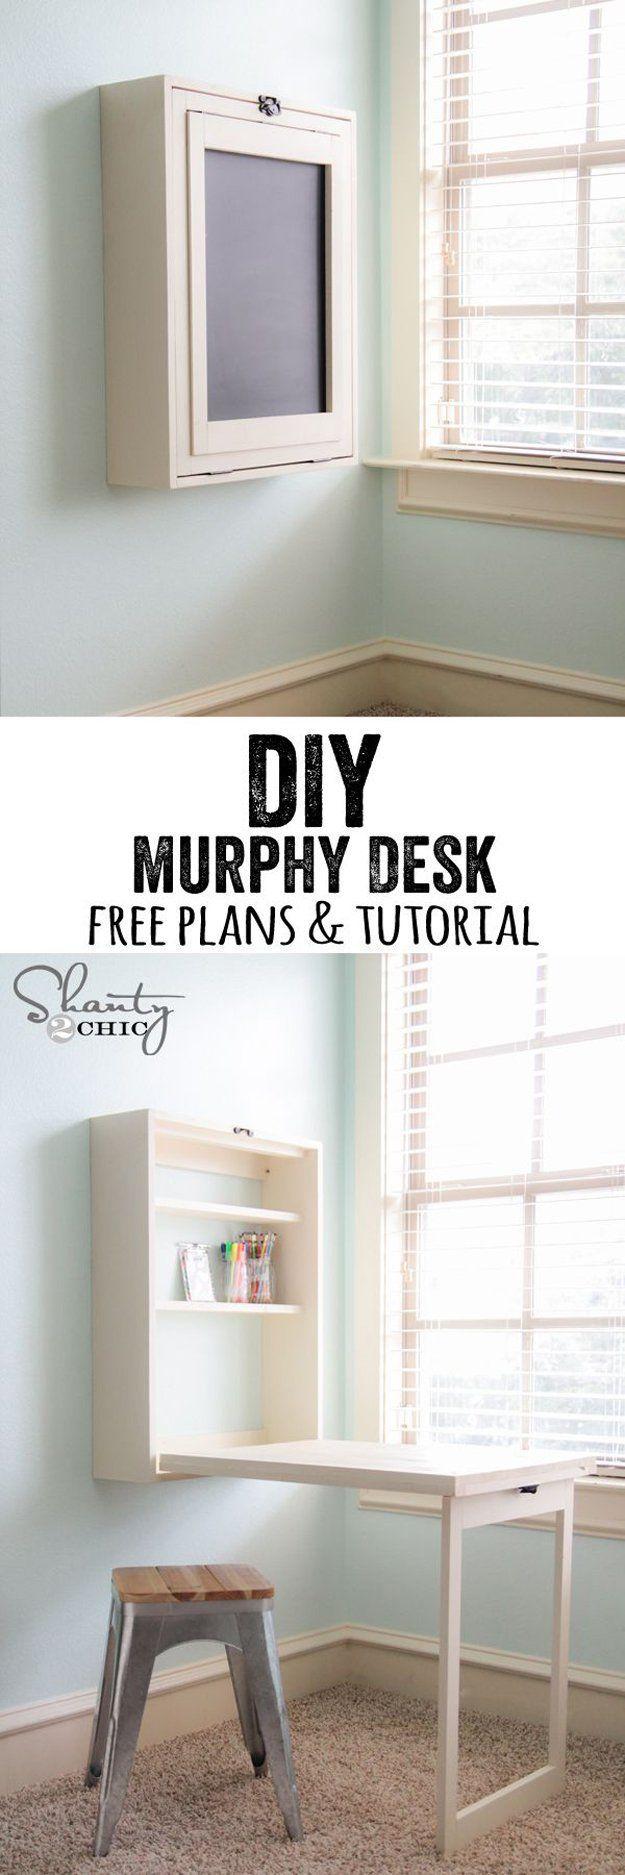 27 DIYs for Small Spaces | Wohnkultur ideen, Teenager basteln und Möbel